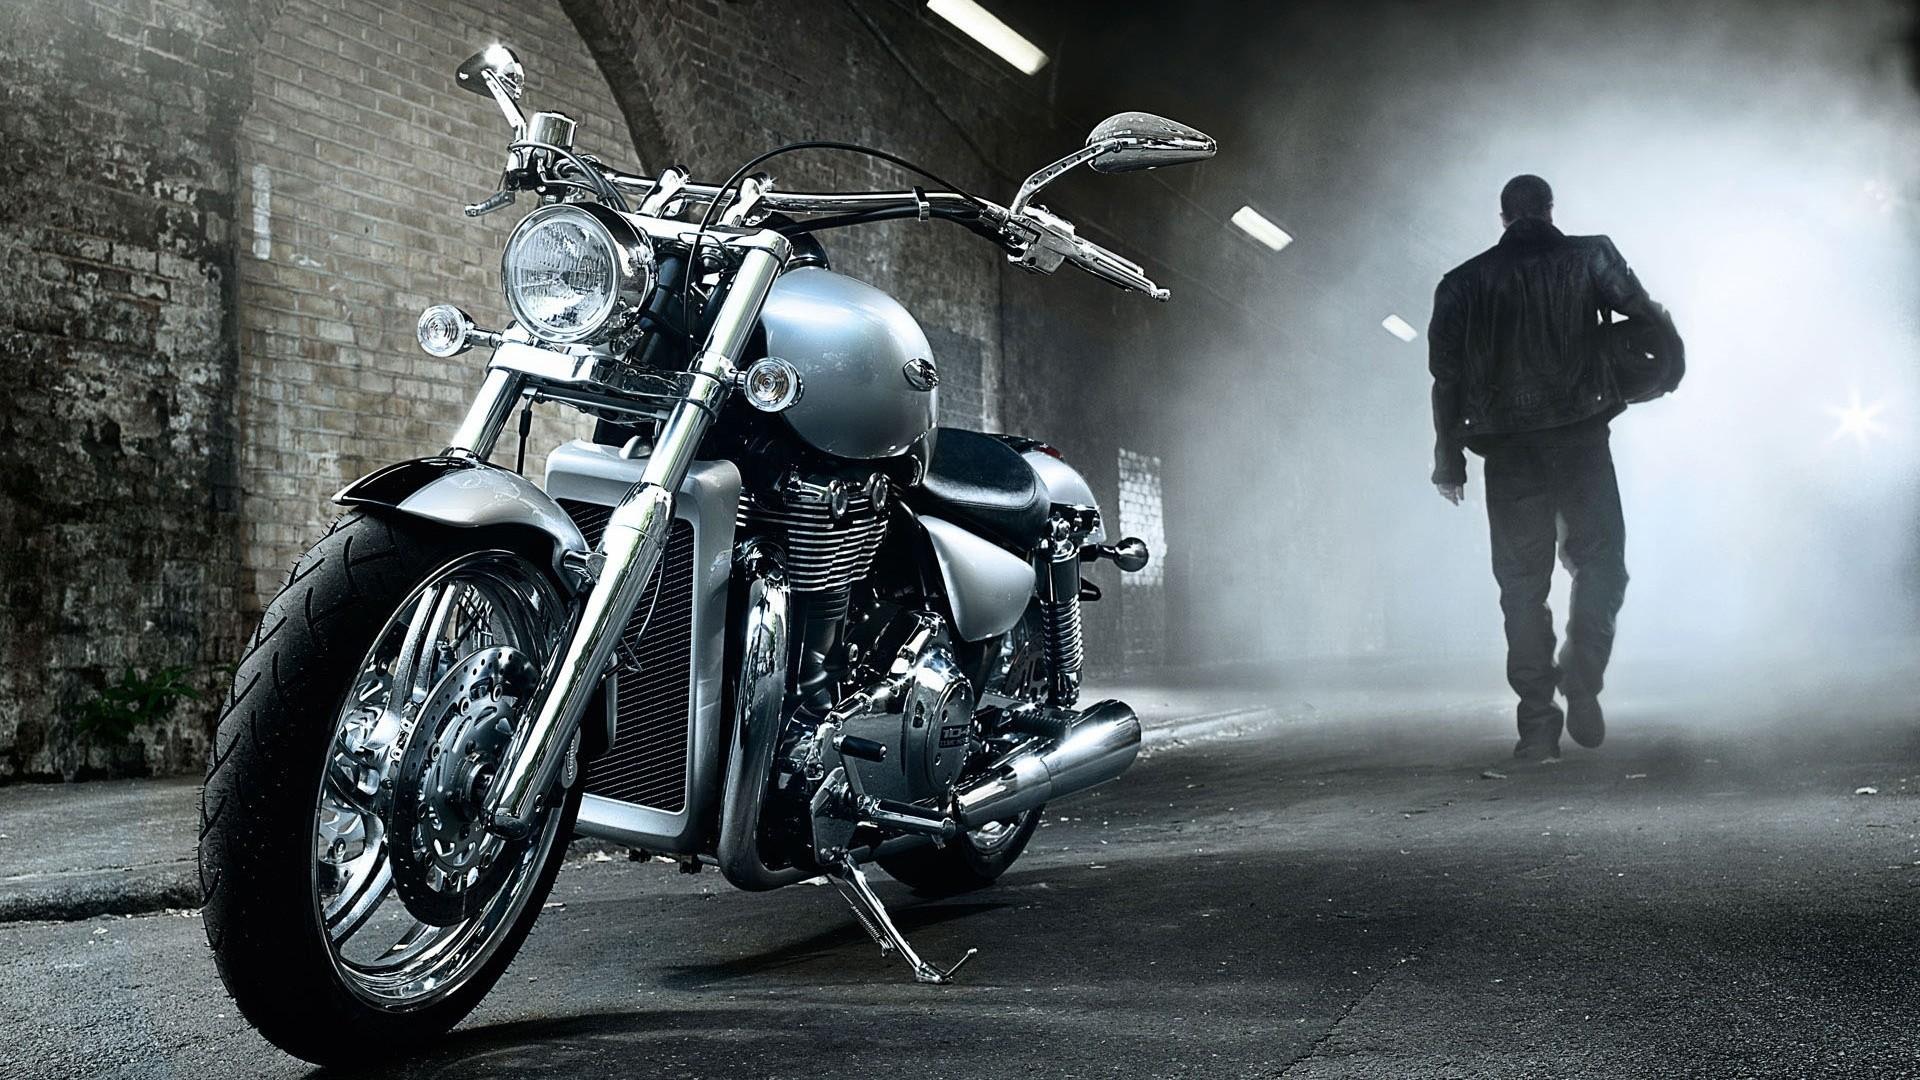 Harley Davidson Wallpaper Photos HD 1920x1080